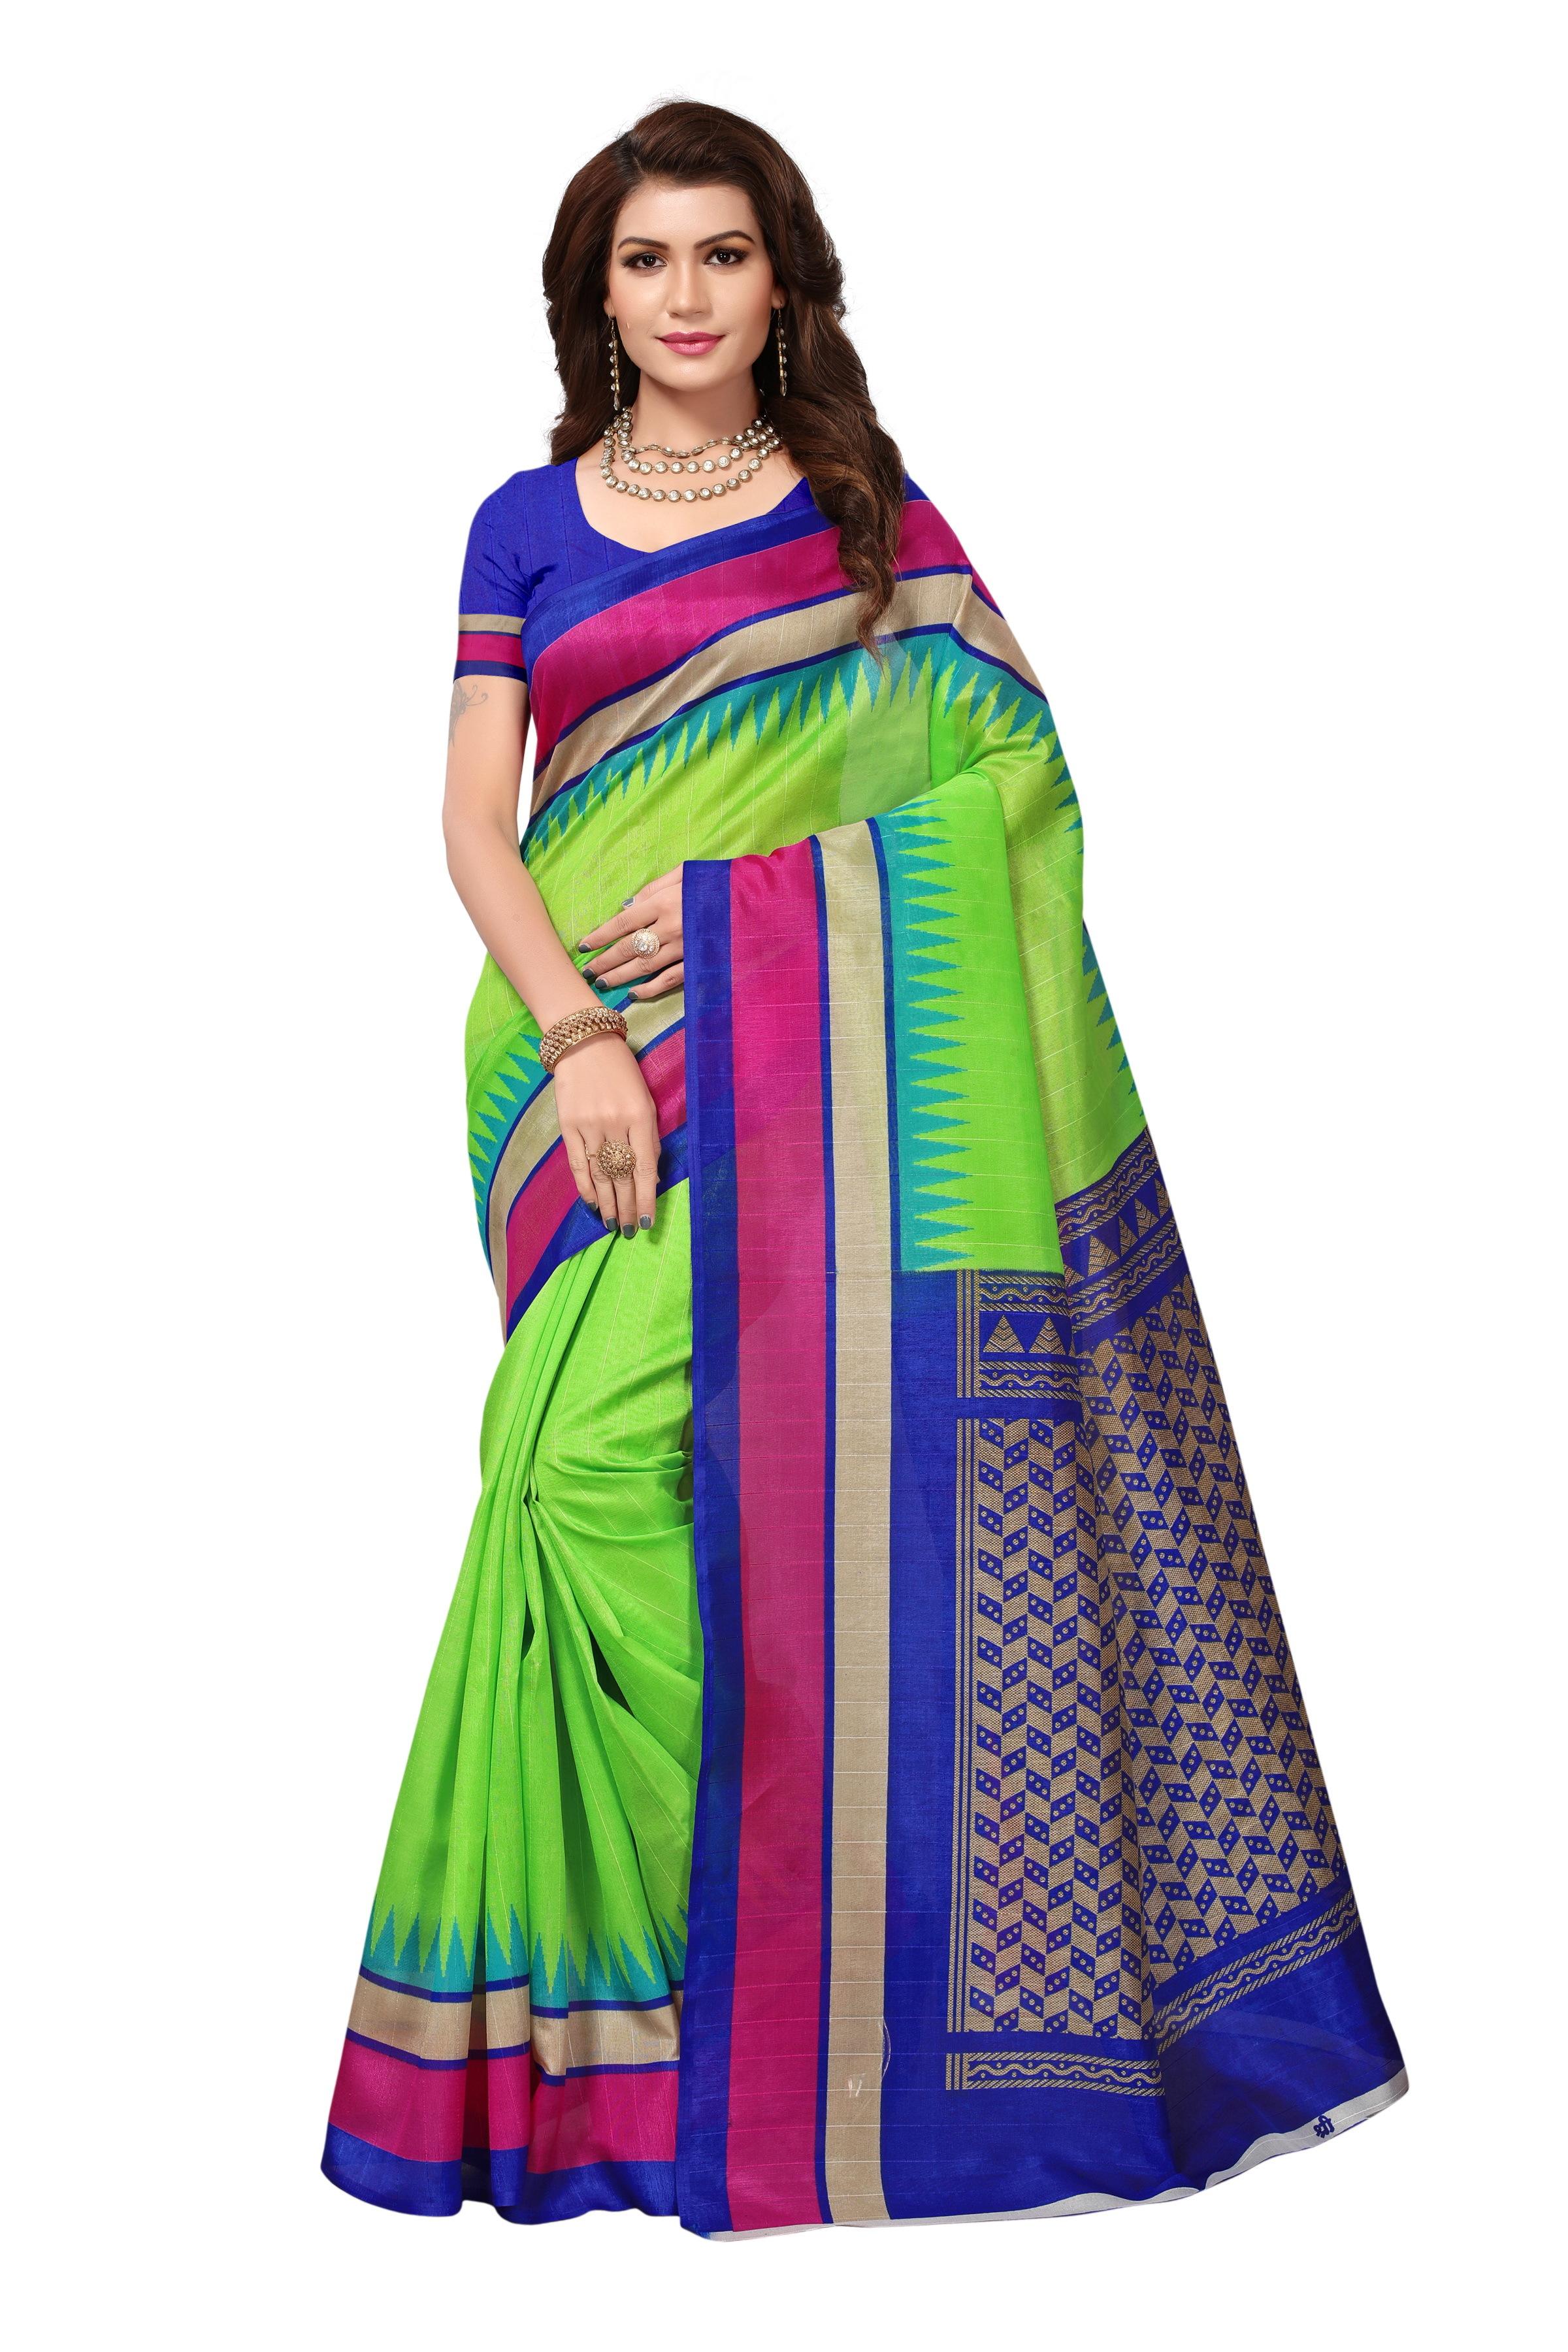 New bhaglpuri Silk saree